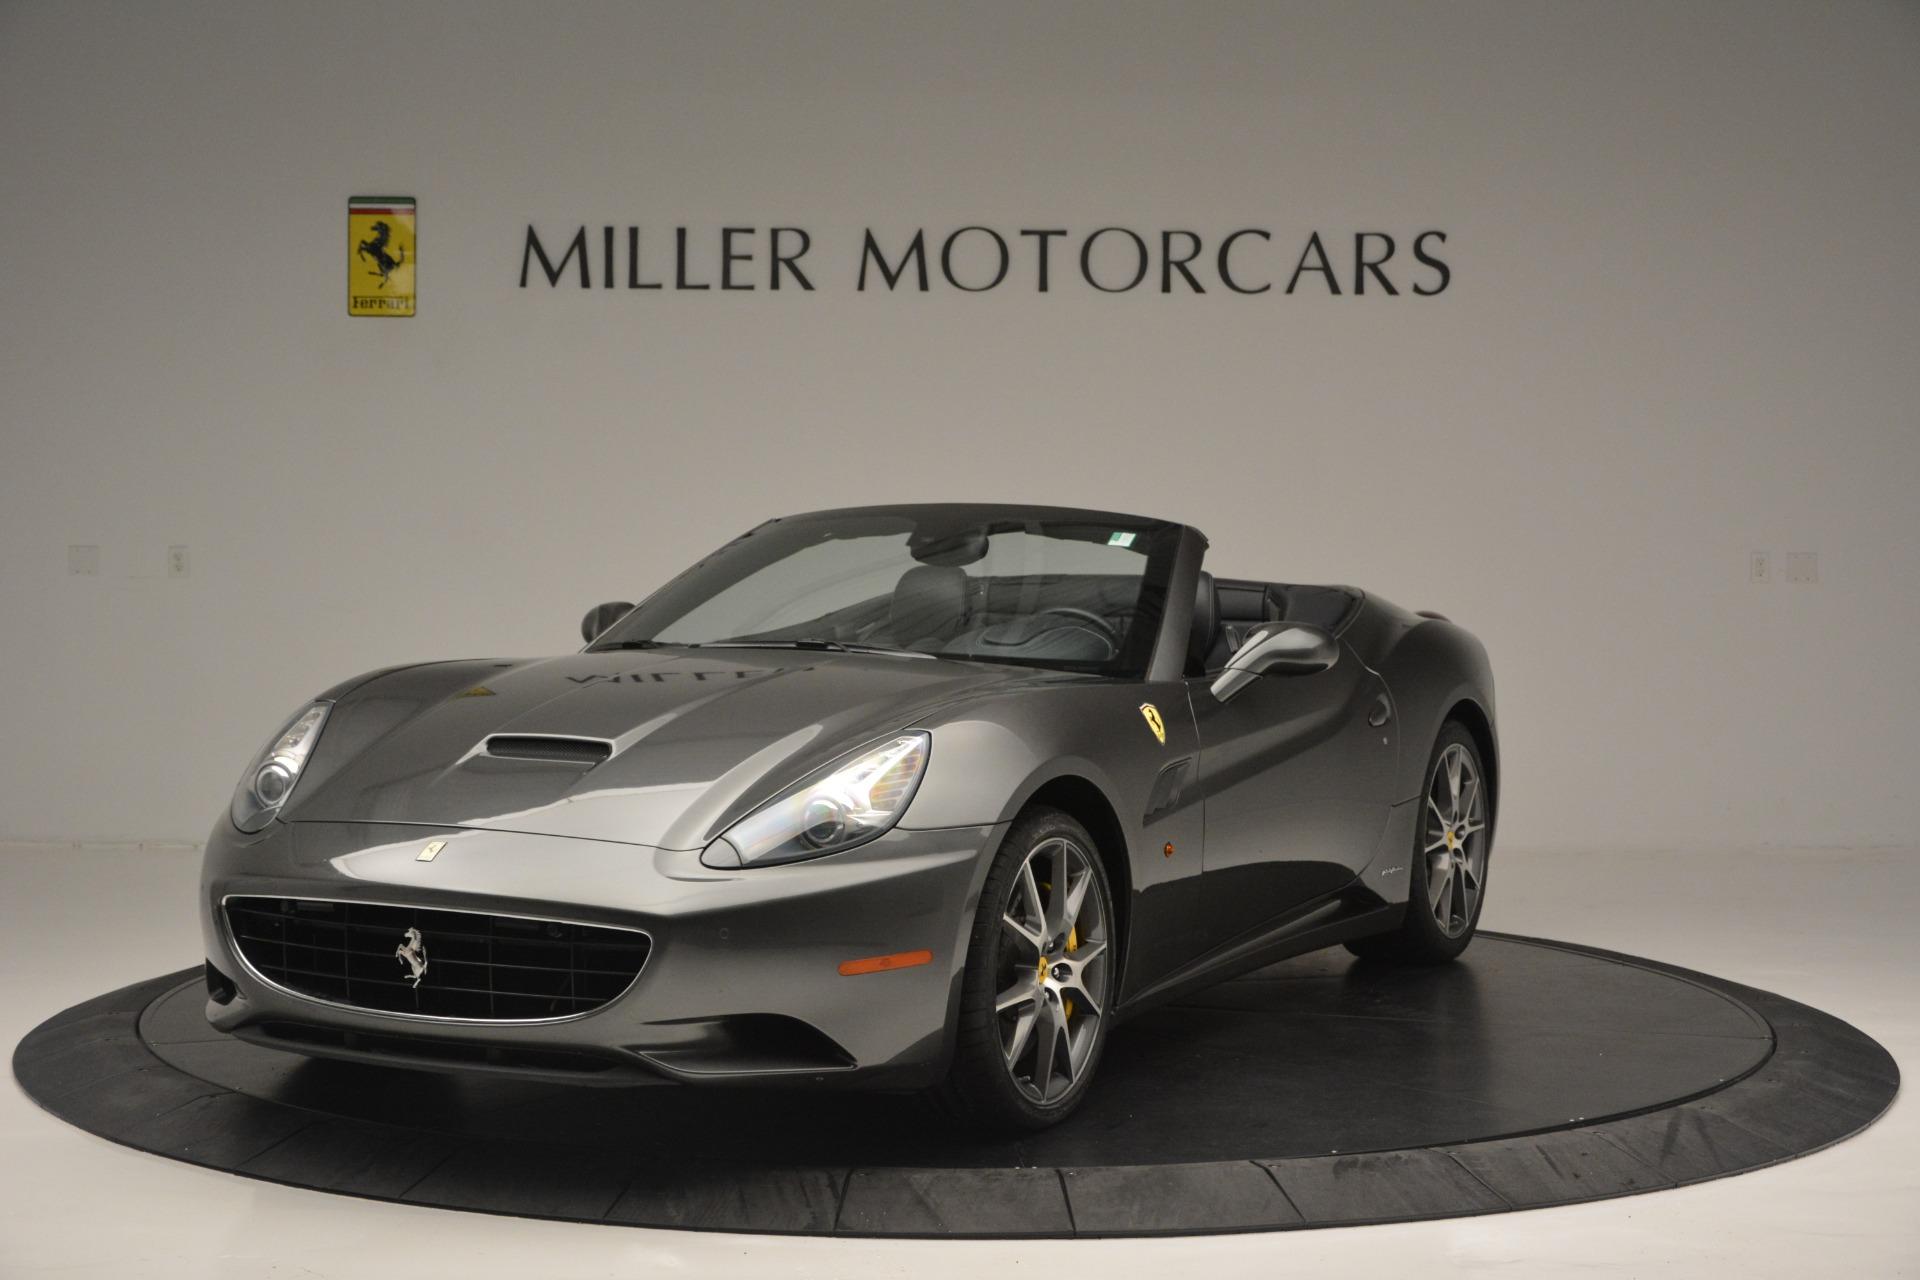 Used 2013 Ferrari California 30 for sale $113,900 at Aston Martin of Greenwich in Greenwich CT 06830 1